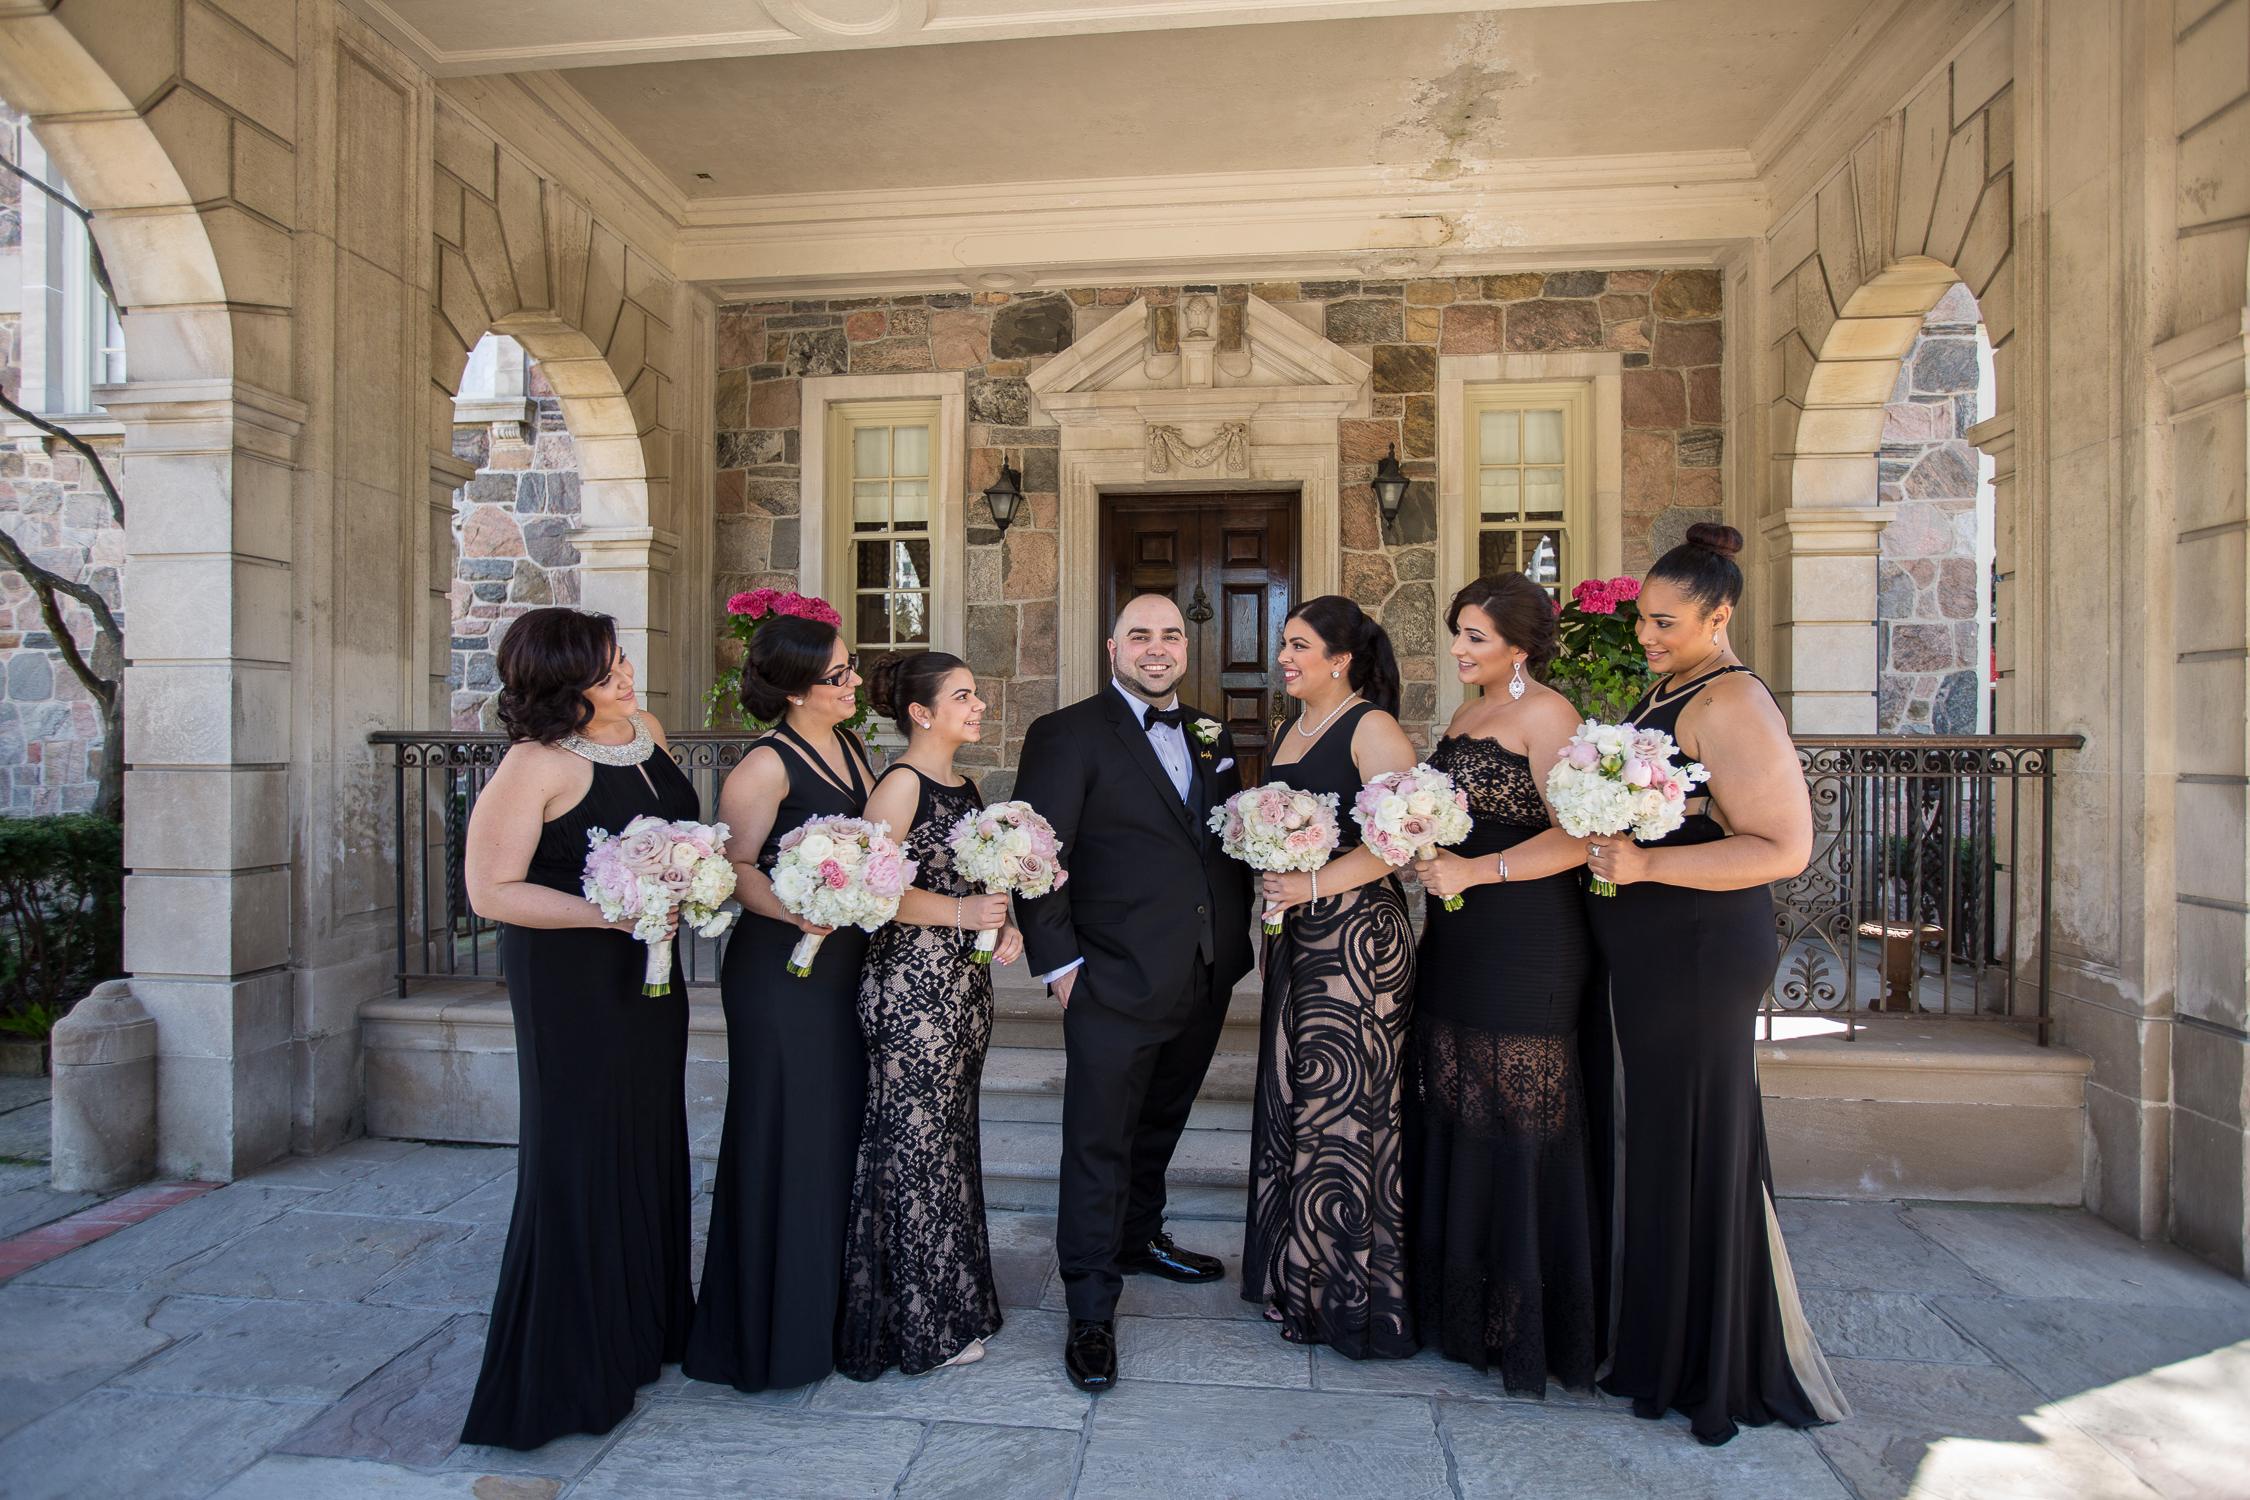 Peter-and-Marie-Wedding-Fontana-Primavera-Graydon-Hall-Manor-Toronto-Ontario-Canada-0027.jpg